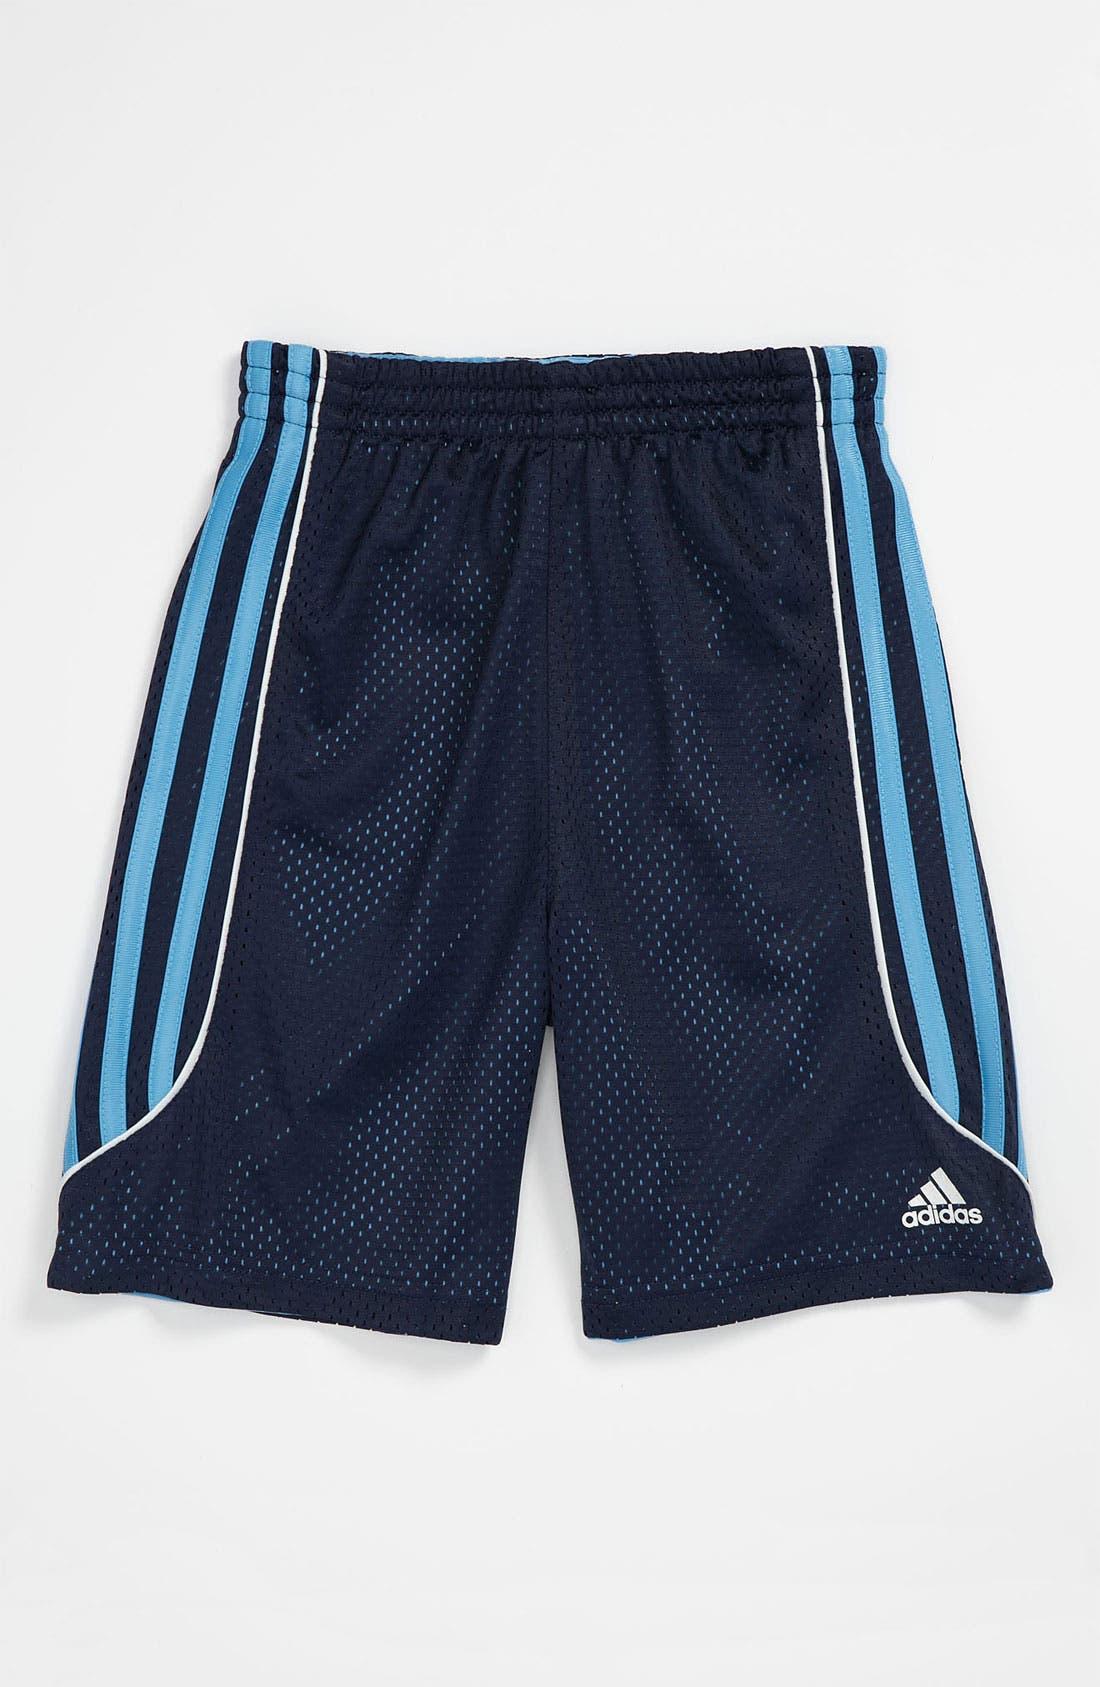 Alternate Image 1 Selected - adidas 'Flip Side' Reversible Shorts (Little Boys)